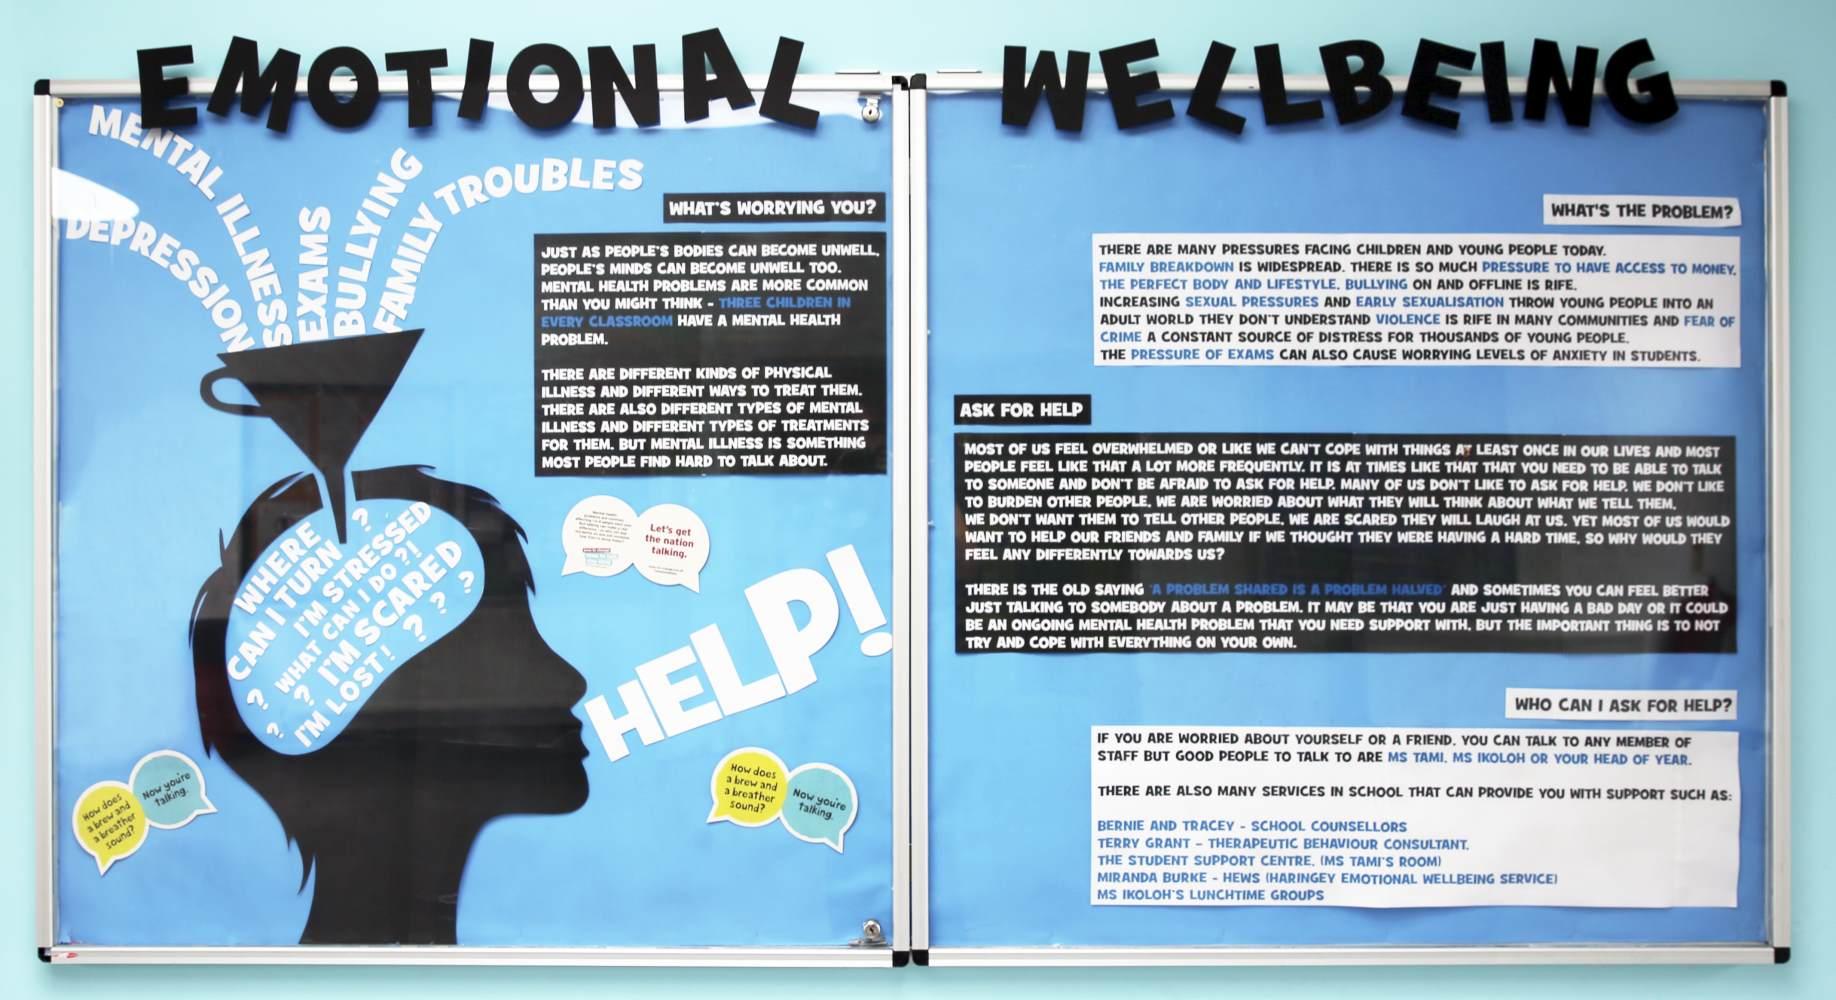 Woodside High School - Emotional wellbeing